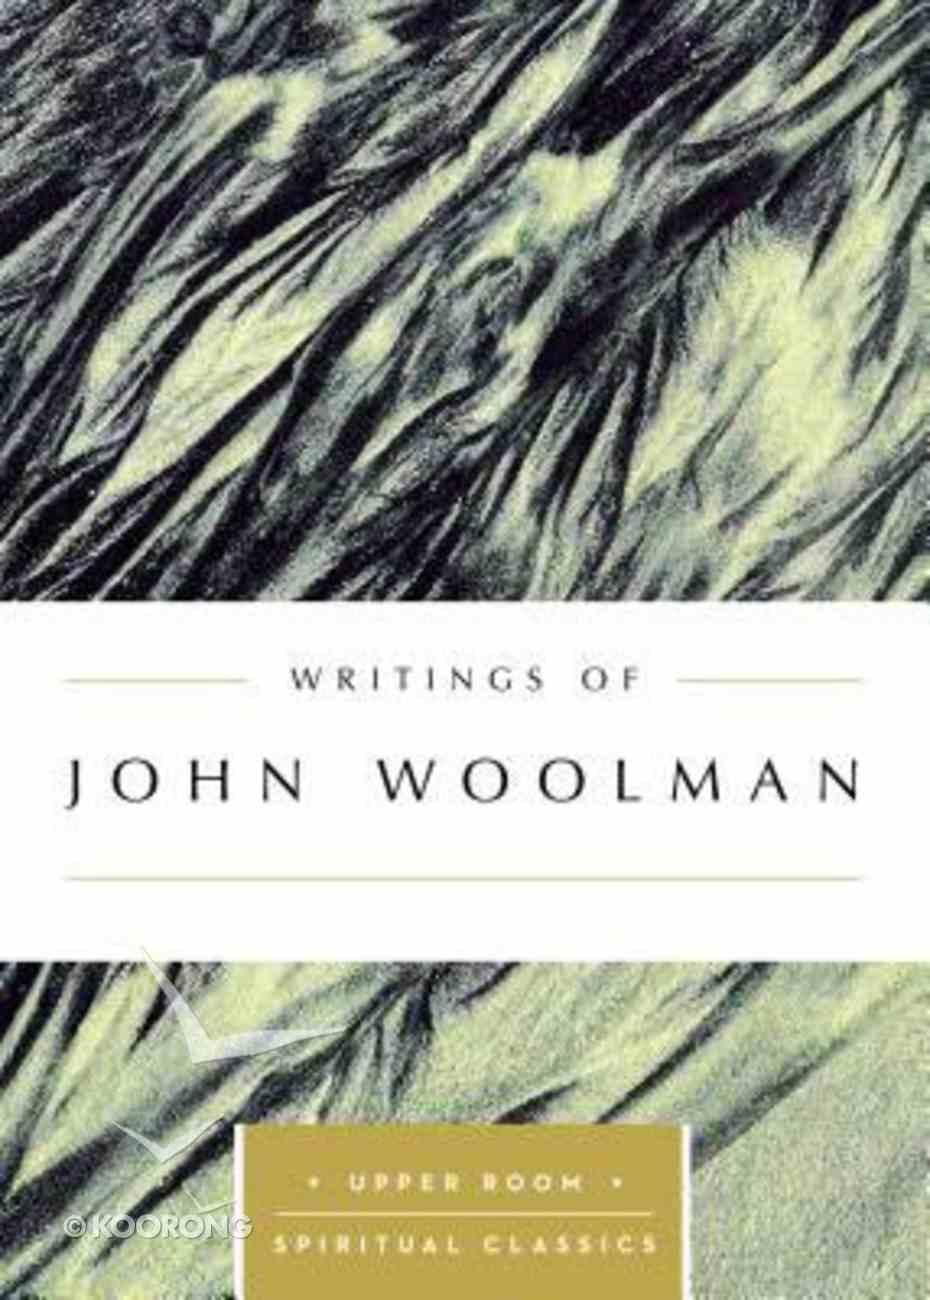 Writings of John Woolman (Upper Room Spiritual Classics Series) Paperback